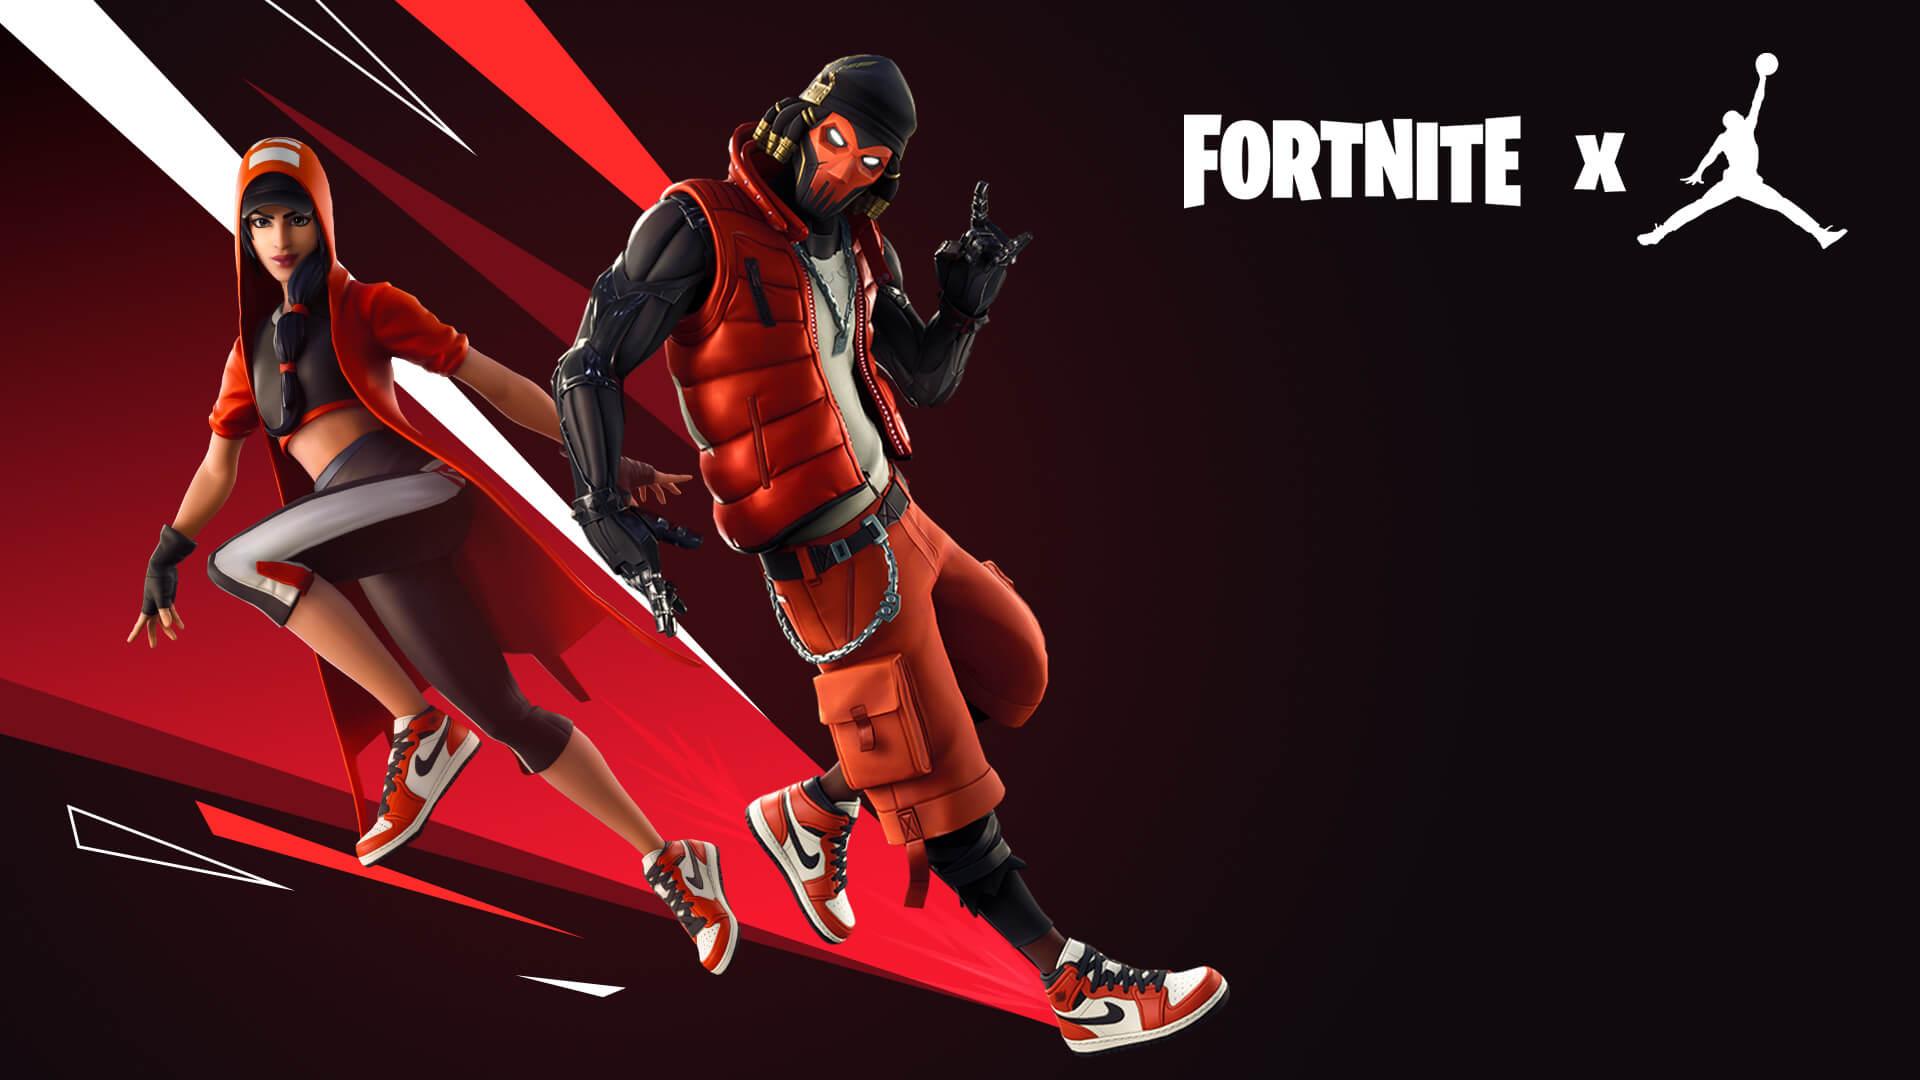 Air Nike Polygon In To Come Partnership Jordans Fortnite VqLSUMGzp